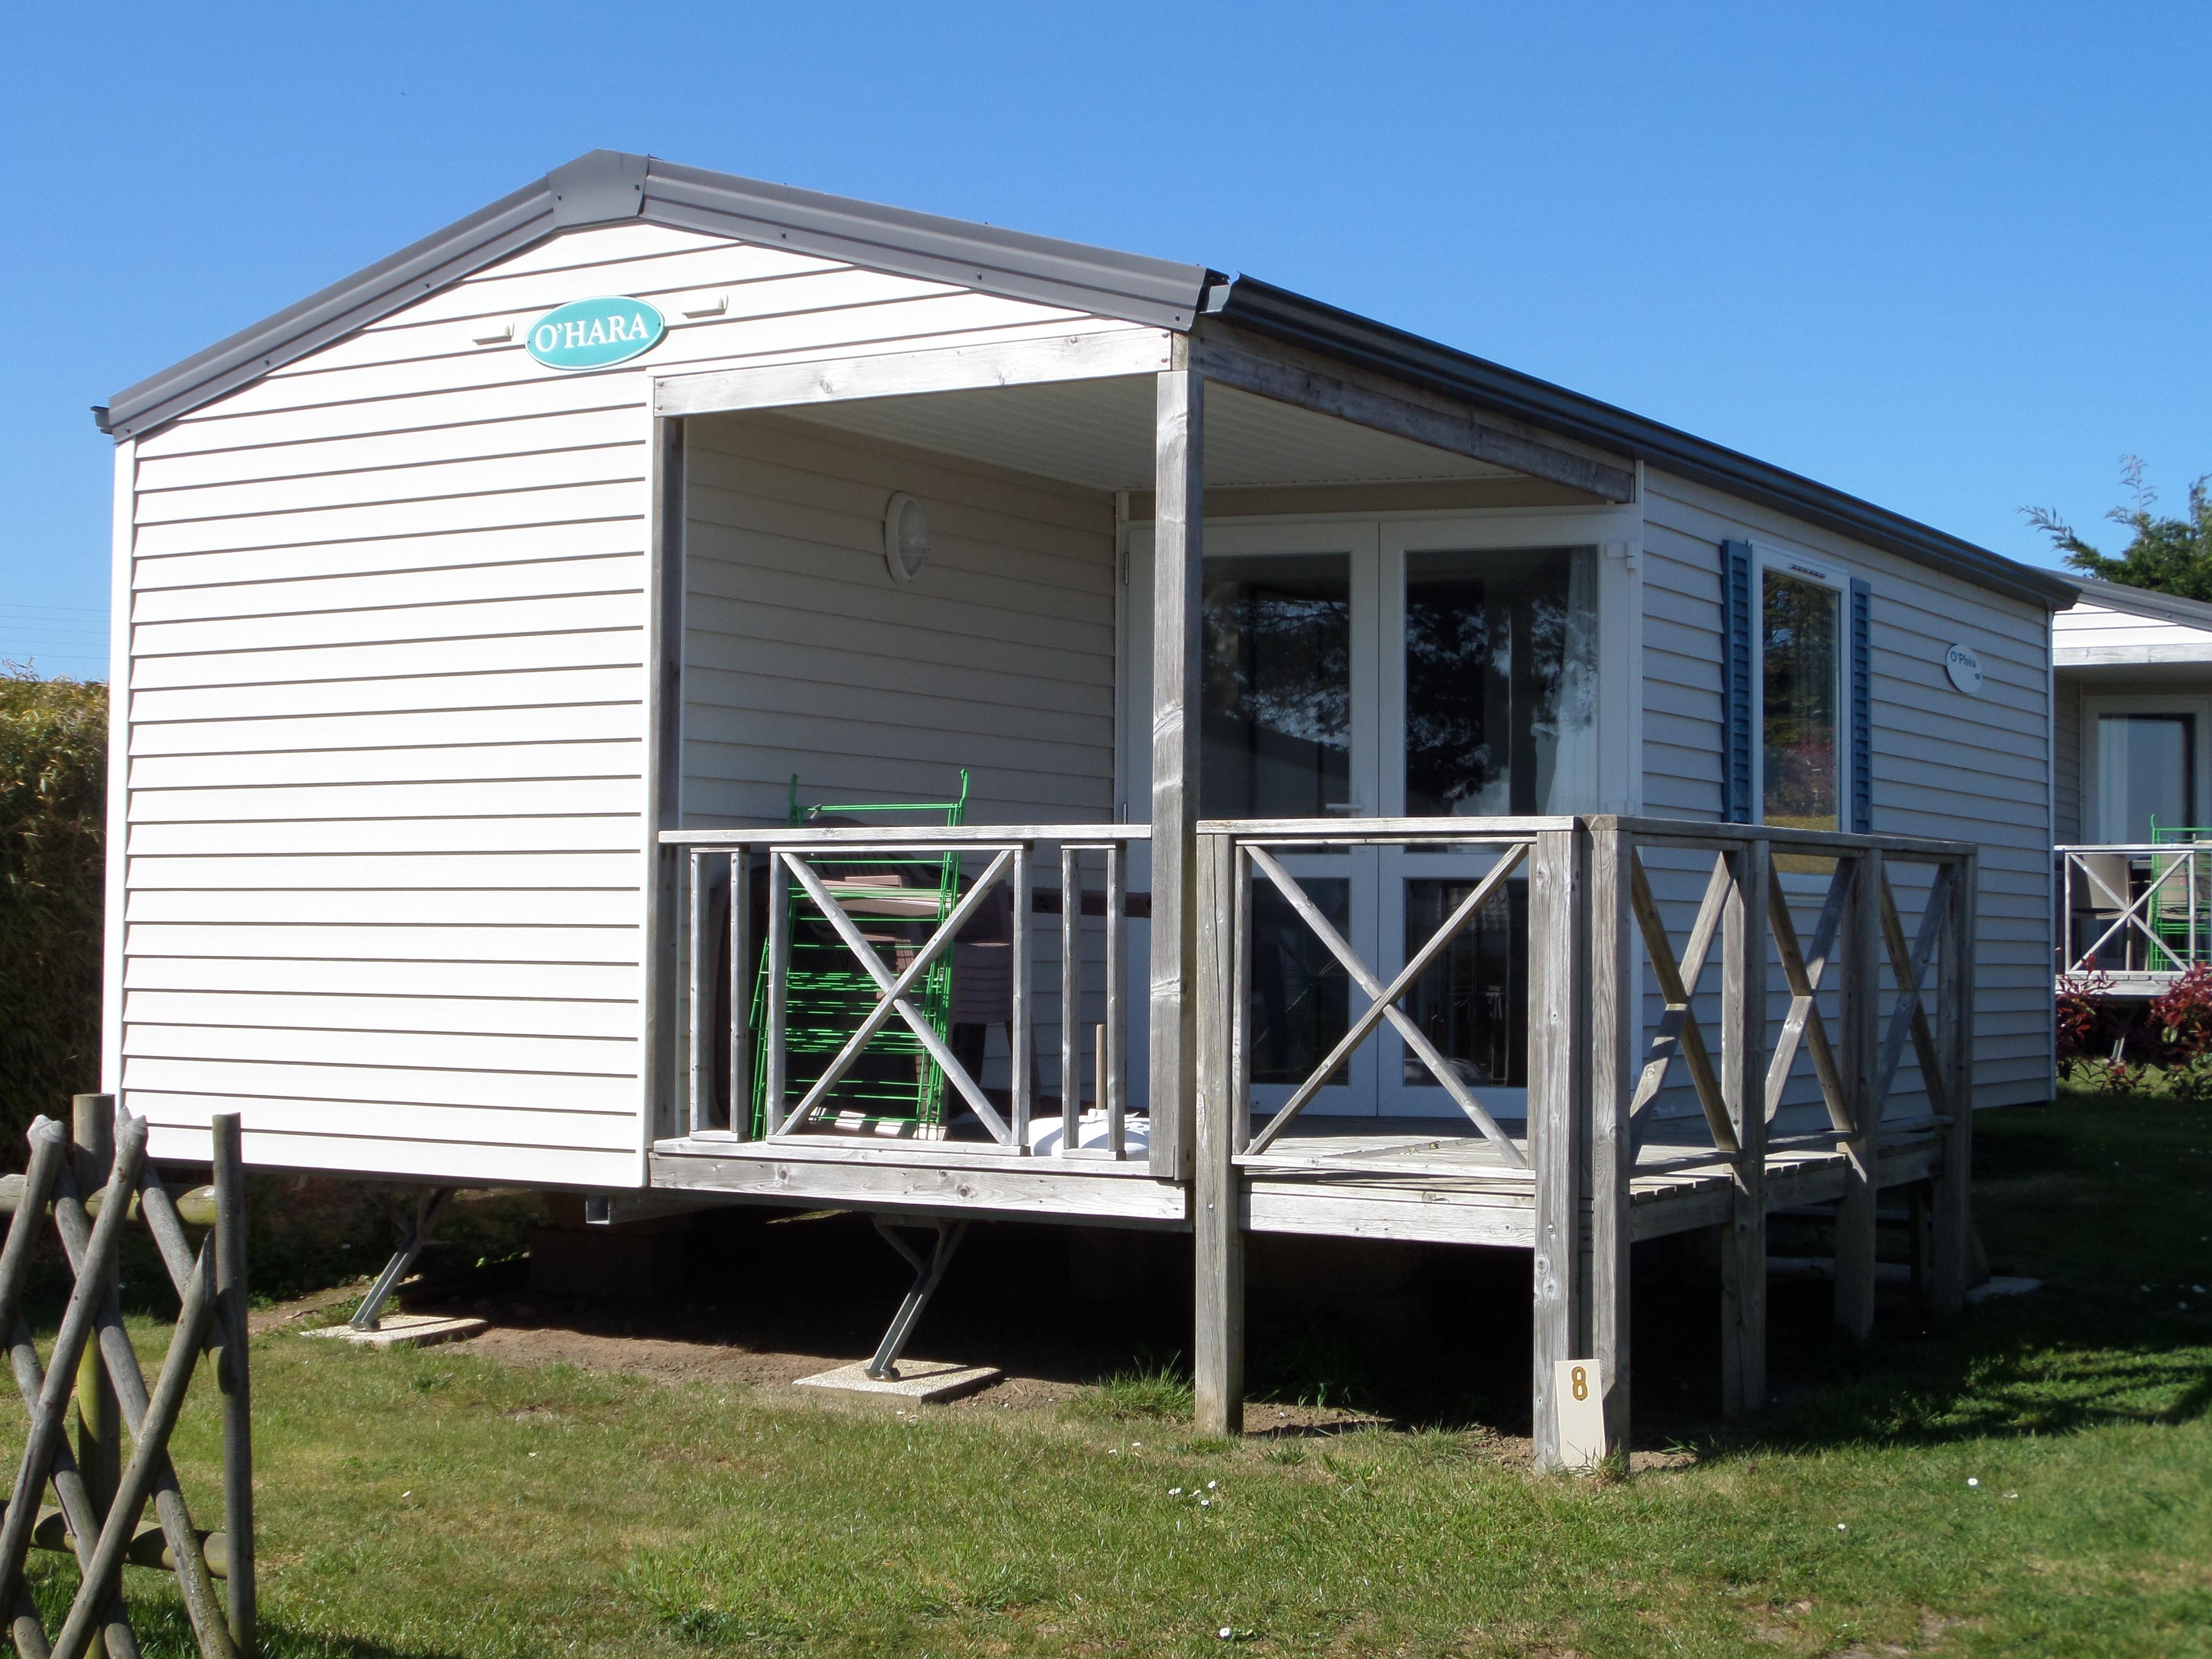 Mobil-home OPHEA 30 m² / 2 chambres - Terrasse couverte petite vue à grande vue mer